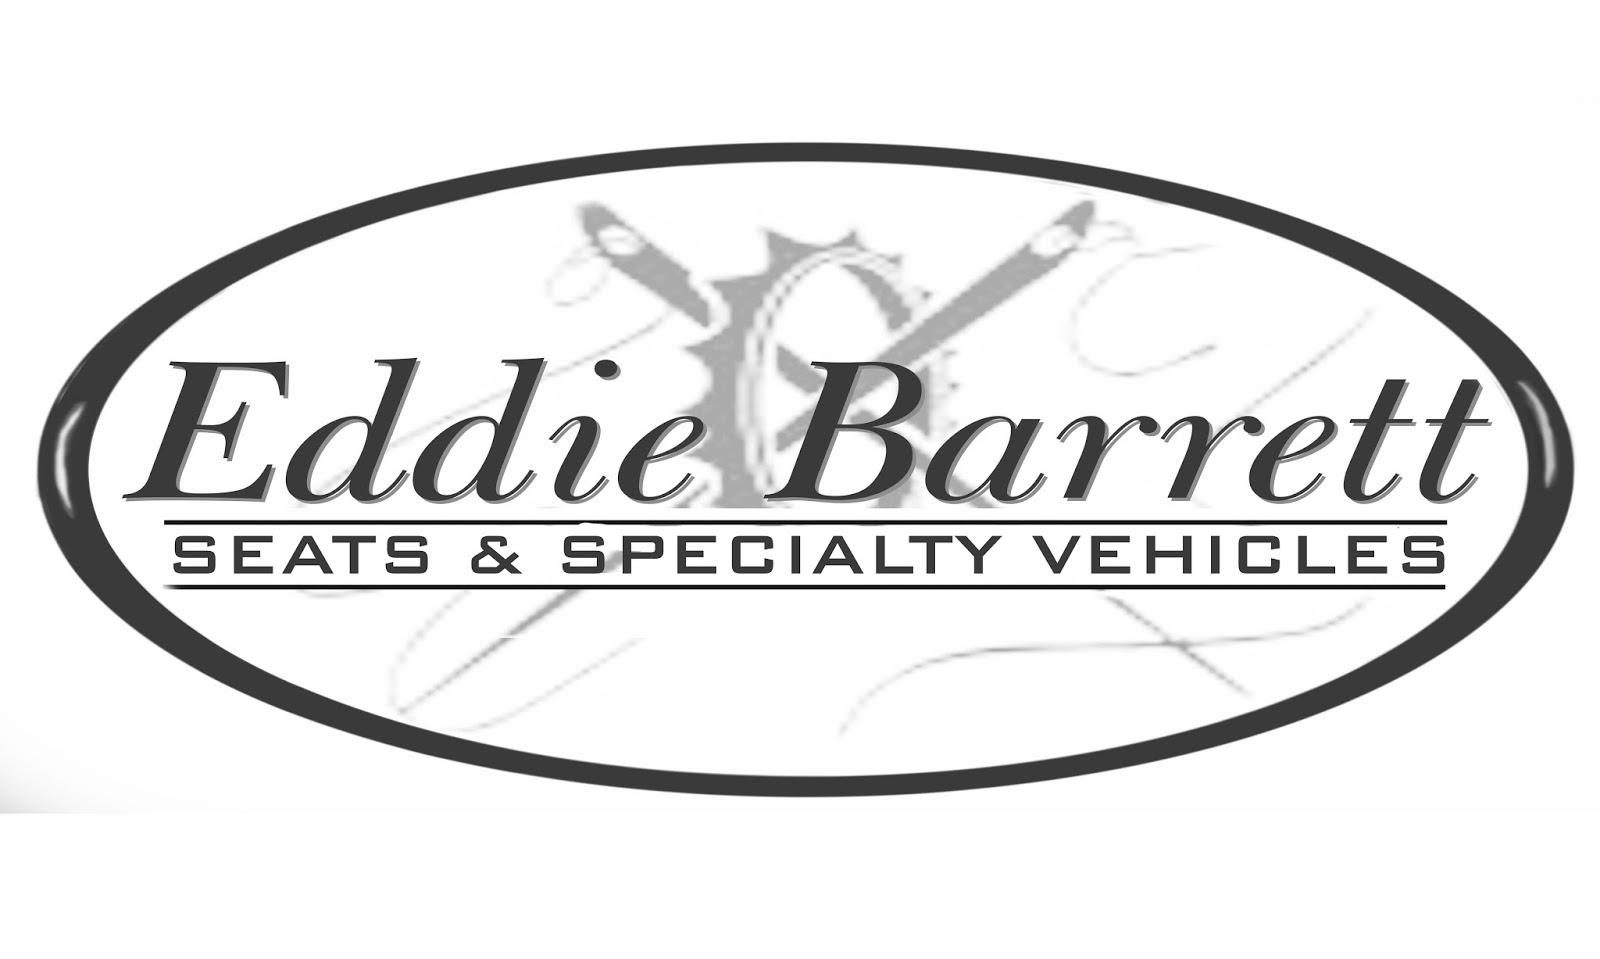 Eddie Barrett Inc